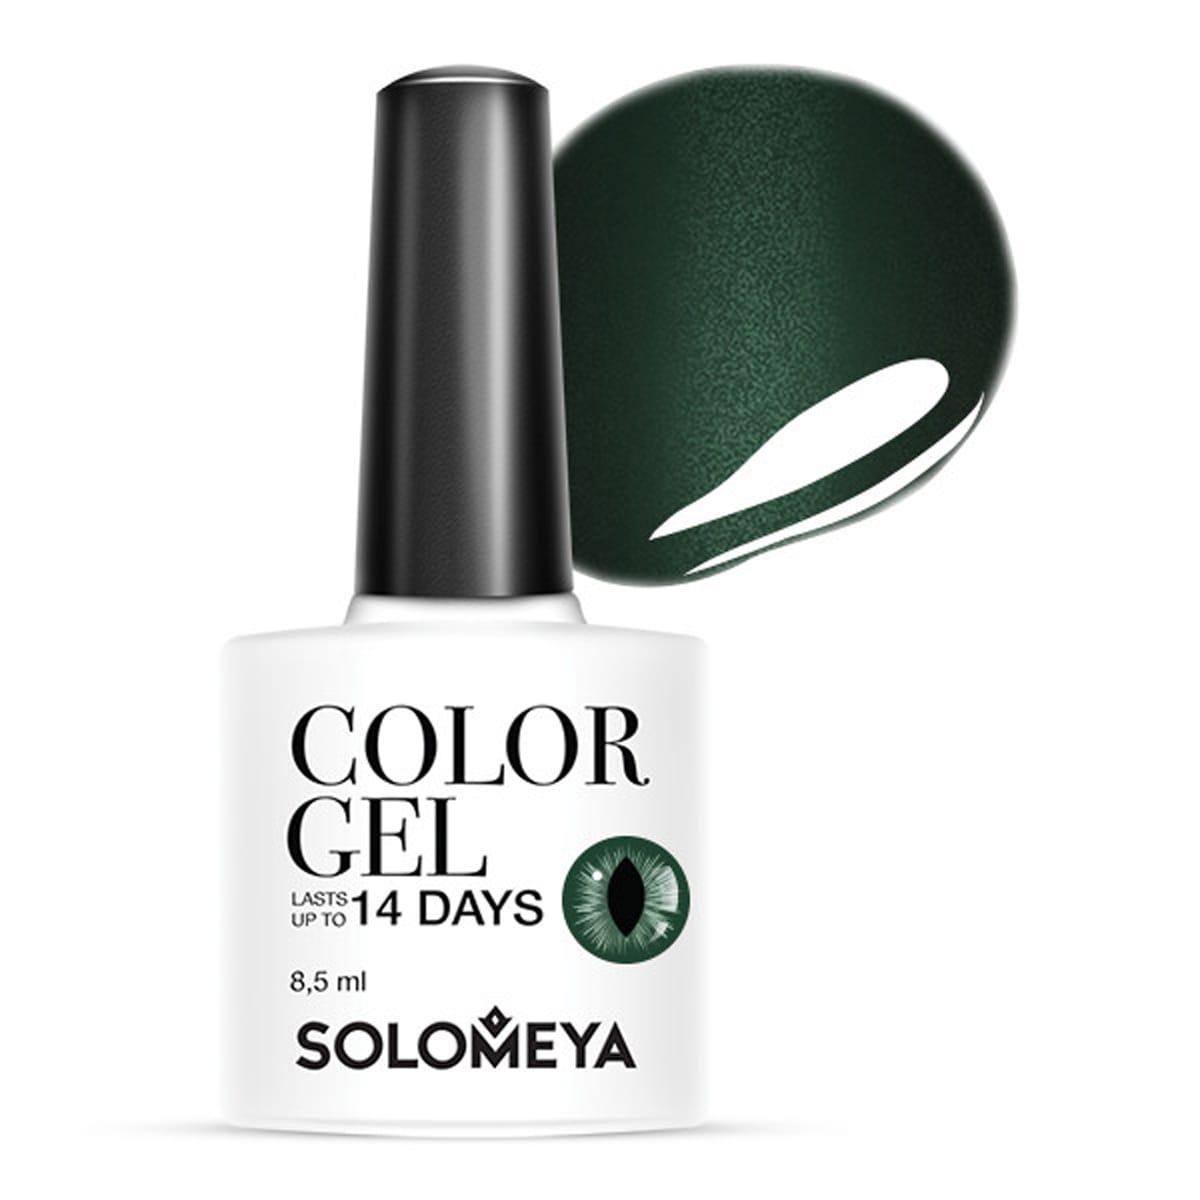 SOLOMEYA Гель-лак для ногтей SCE010 Кошачий глаз, холодный зеленый / Cat Eye Gel Cool Green 8,5 мл цена